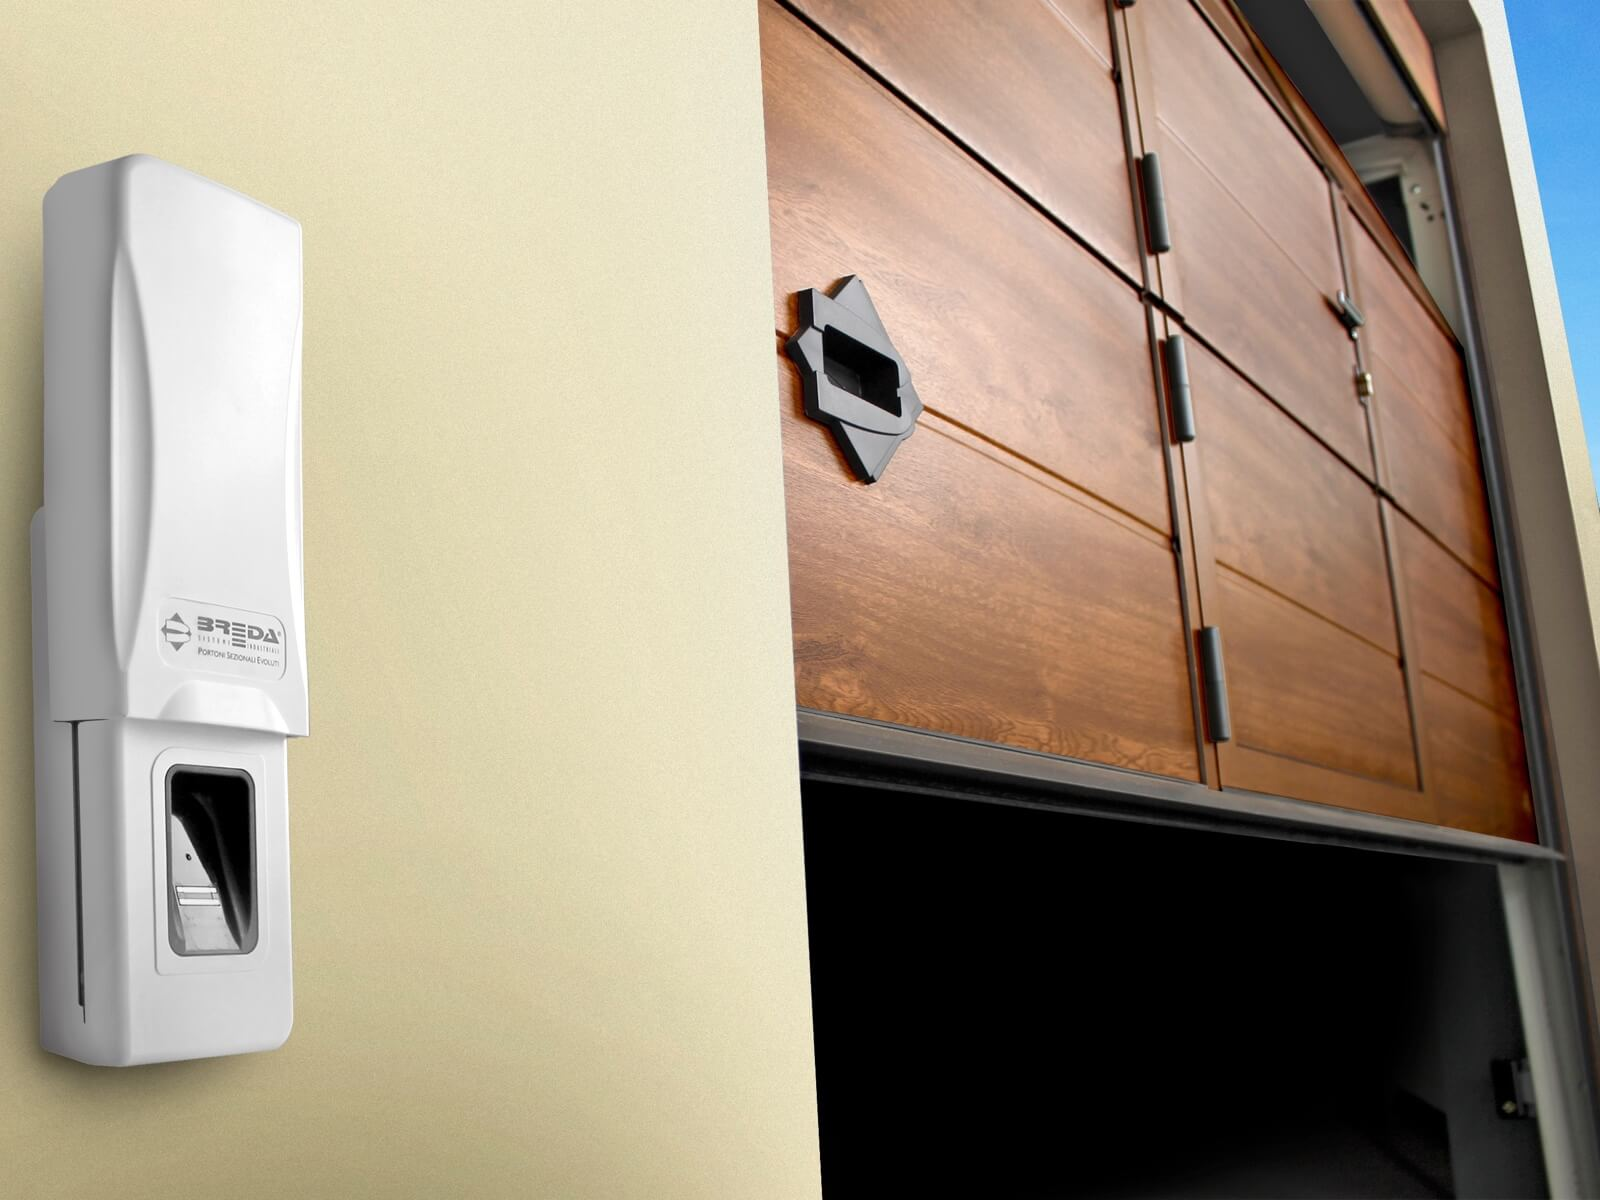 Lettore impronte digitali wireless Cupis Ultra Touch